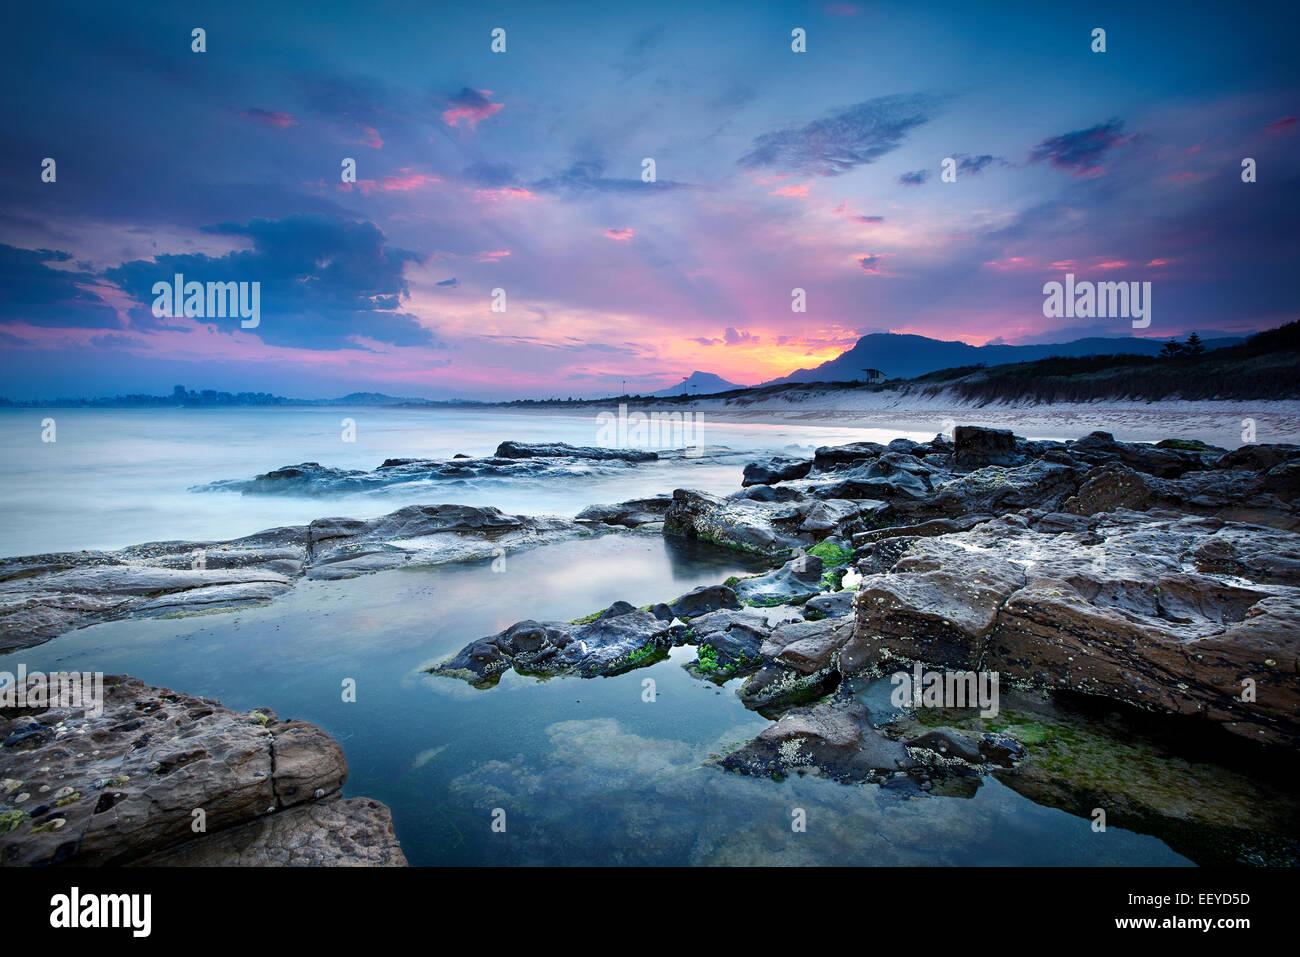 Seascape australienne Photo Stock